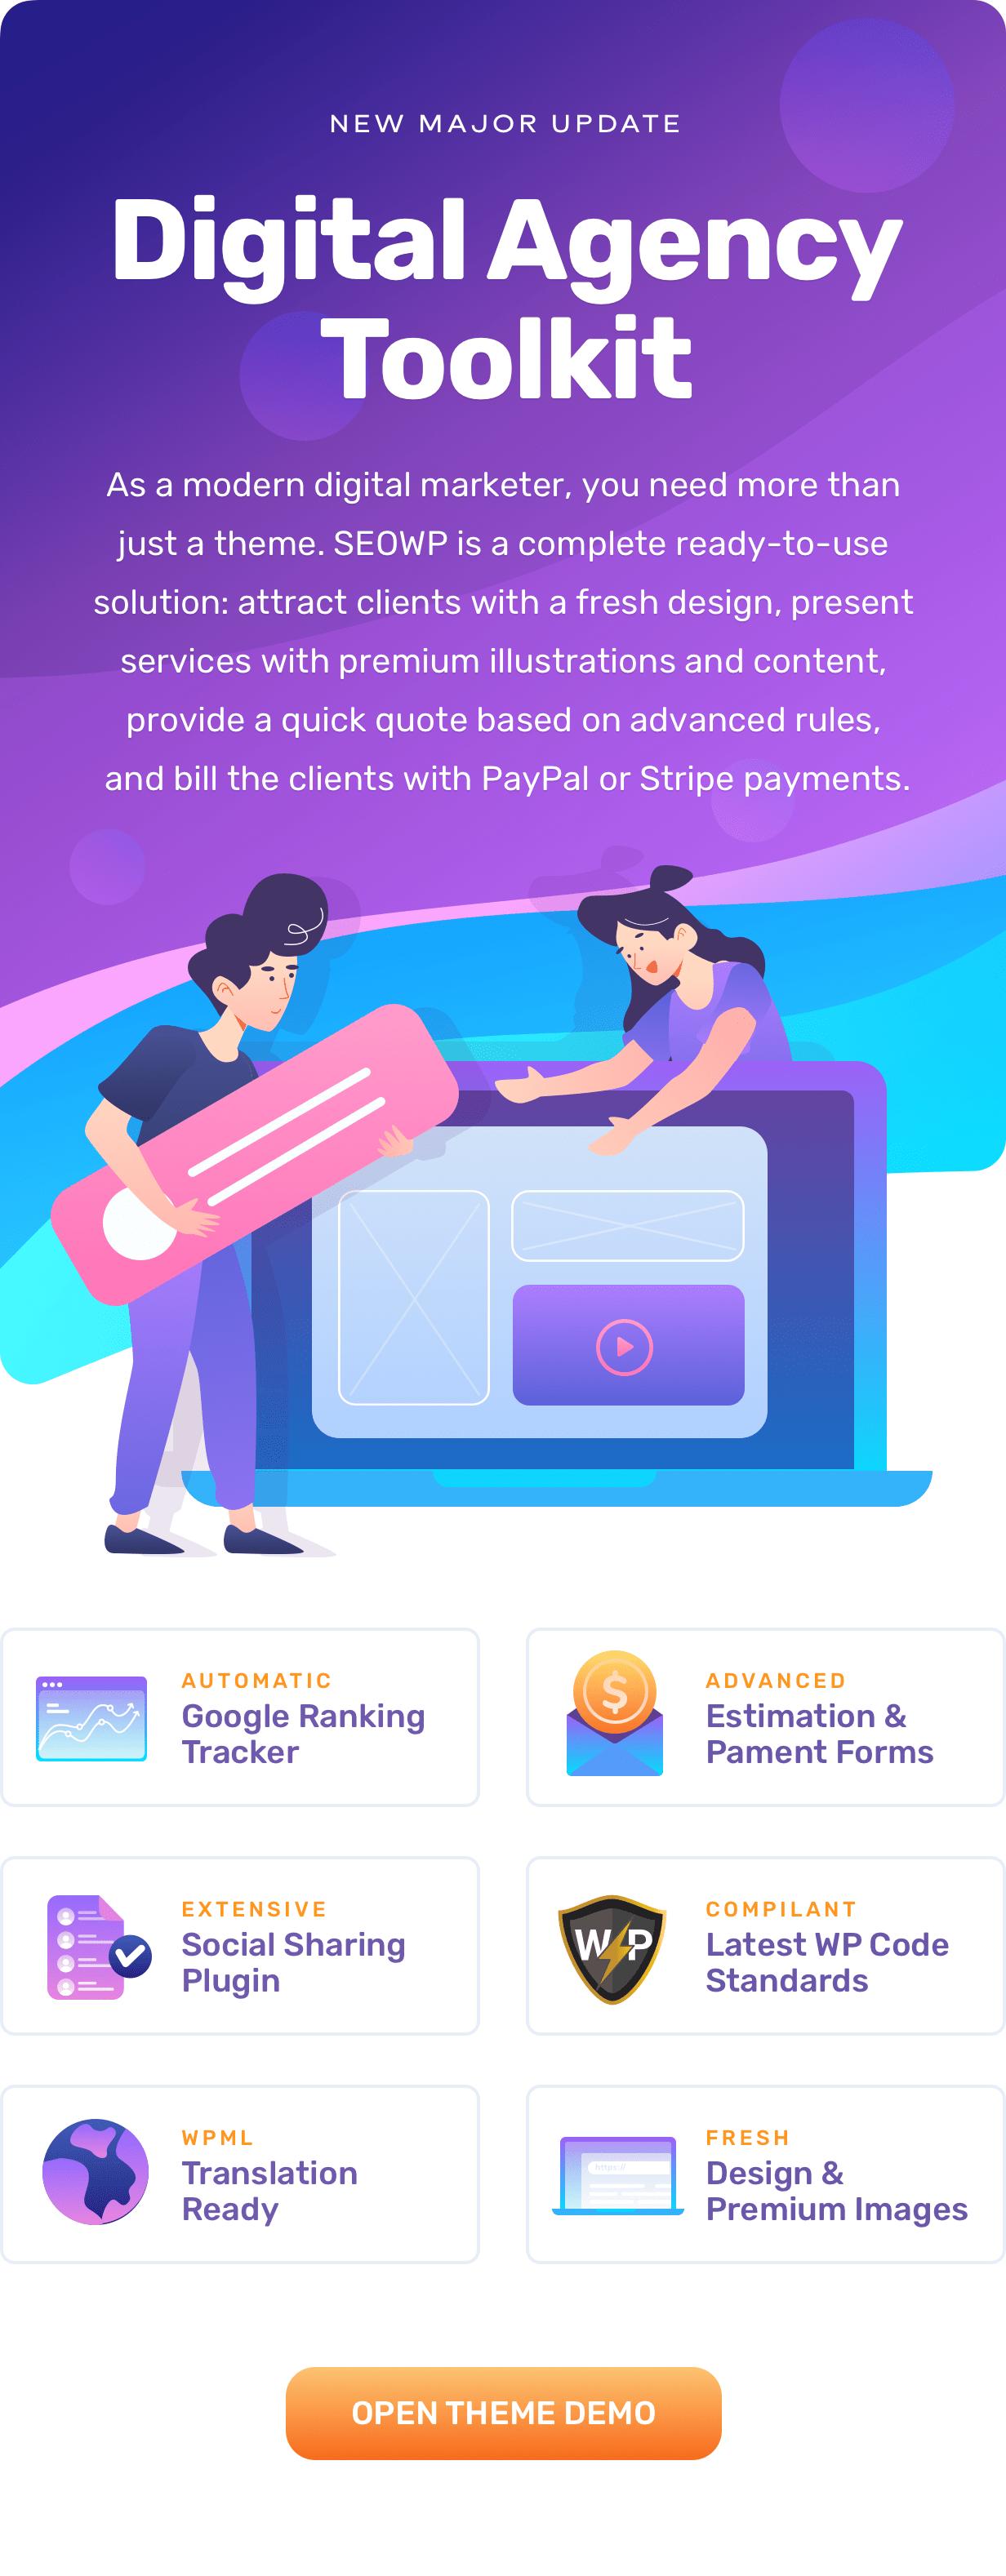 SEOWP | SEO & Digital Agency WordPress Theme - 1